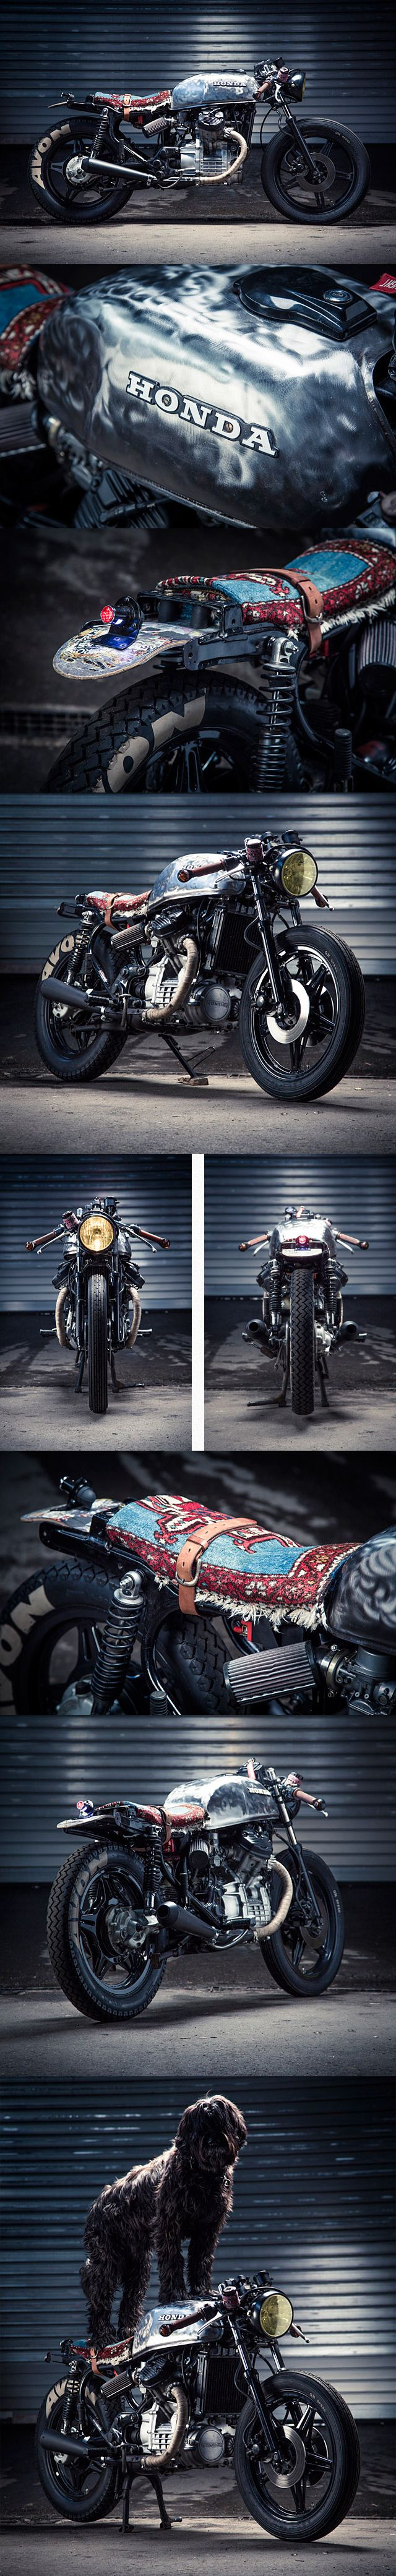 78 Honda Cx500 Patrick Sauter Honda Cx500 Cafe Racer Bikes Cafe Racer